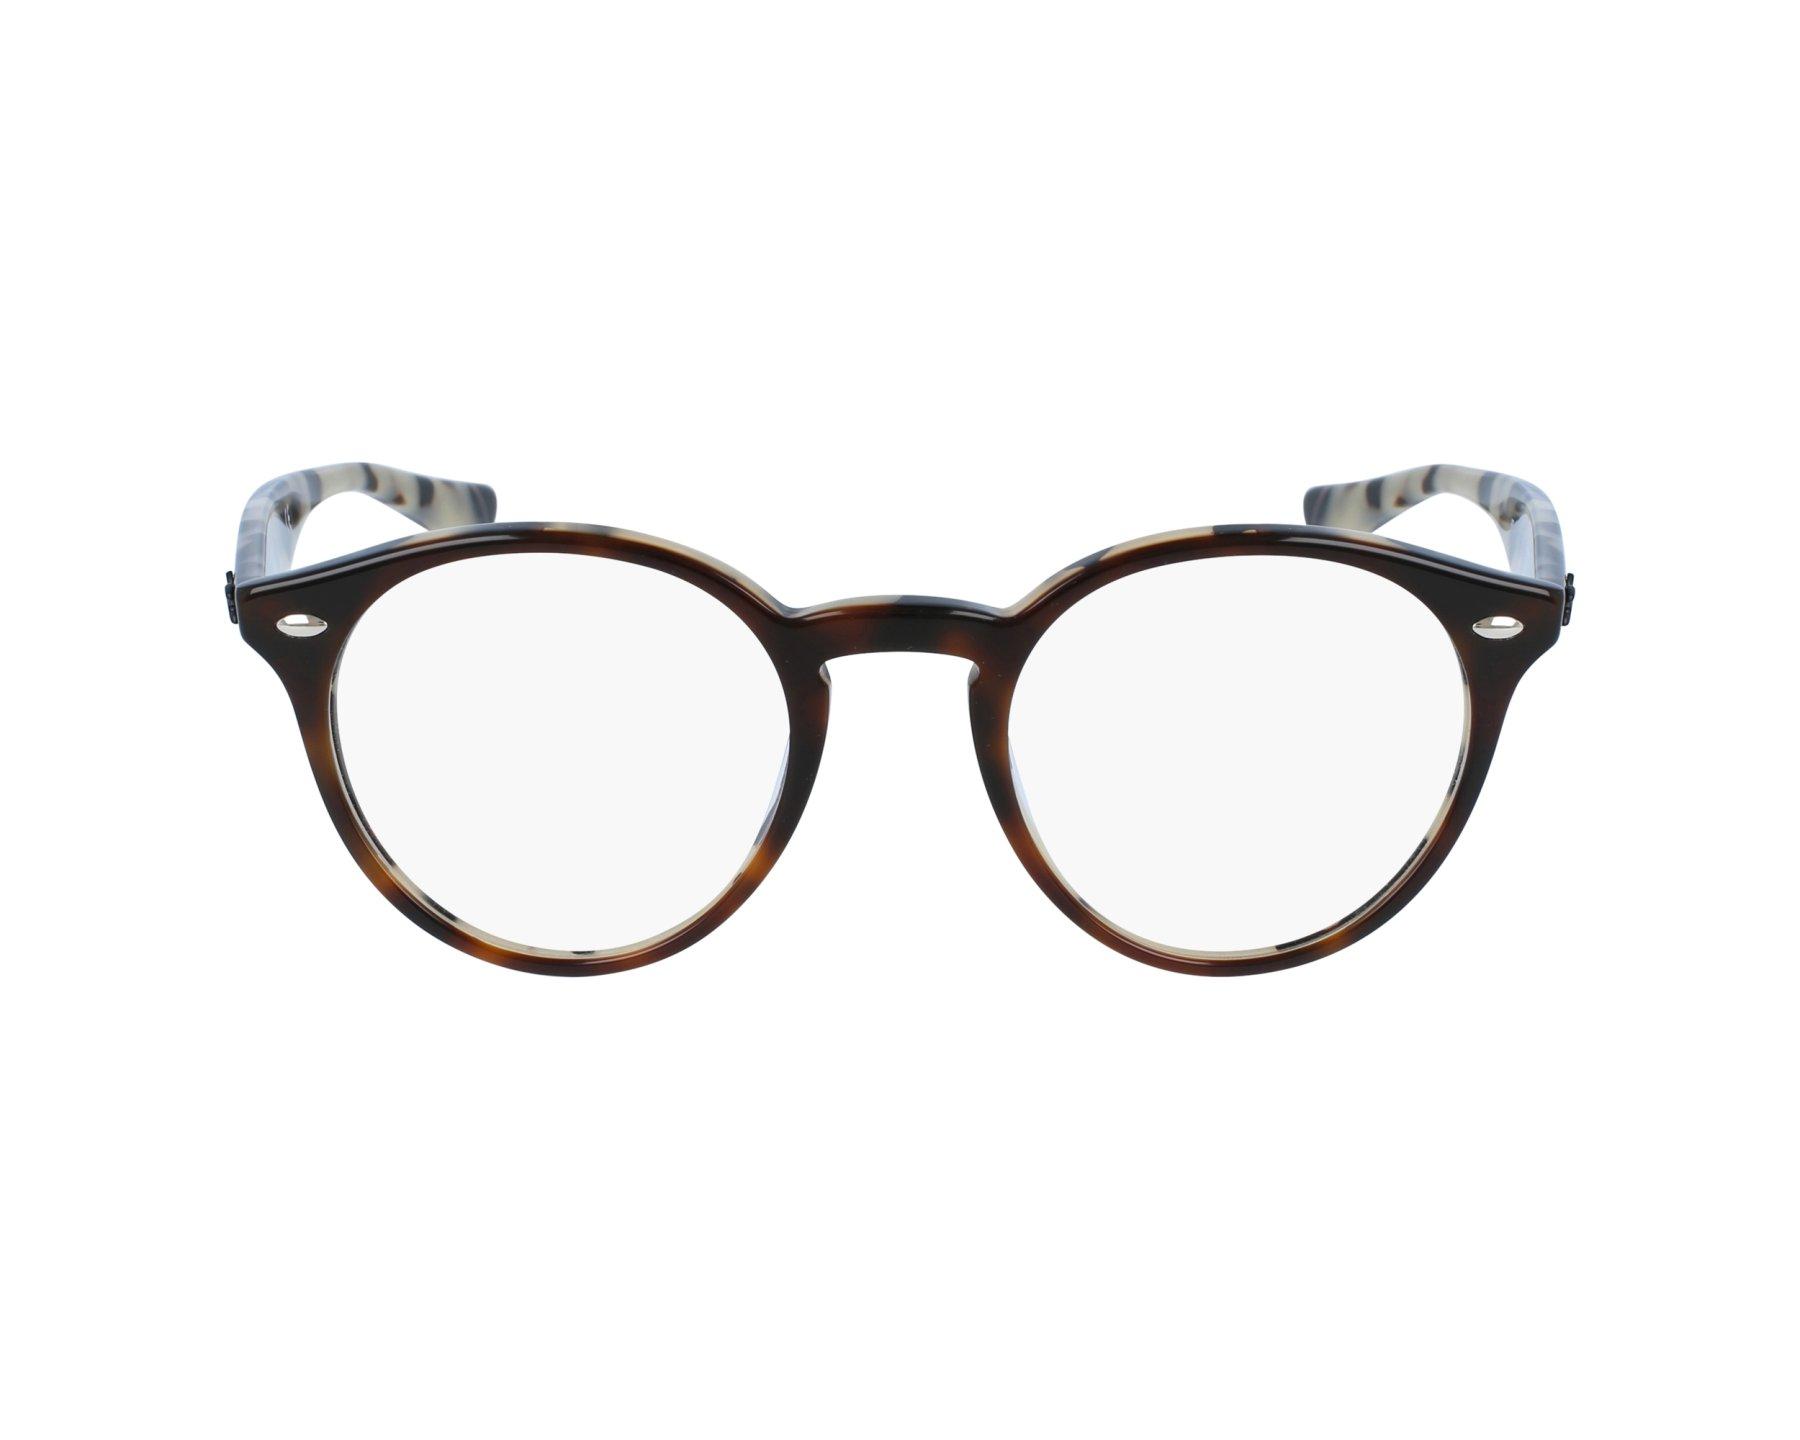 ffca5c23bd eyeglasses Ray-Ban RX-2180-V 5676 47-21 Havana Brown profile